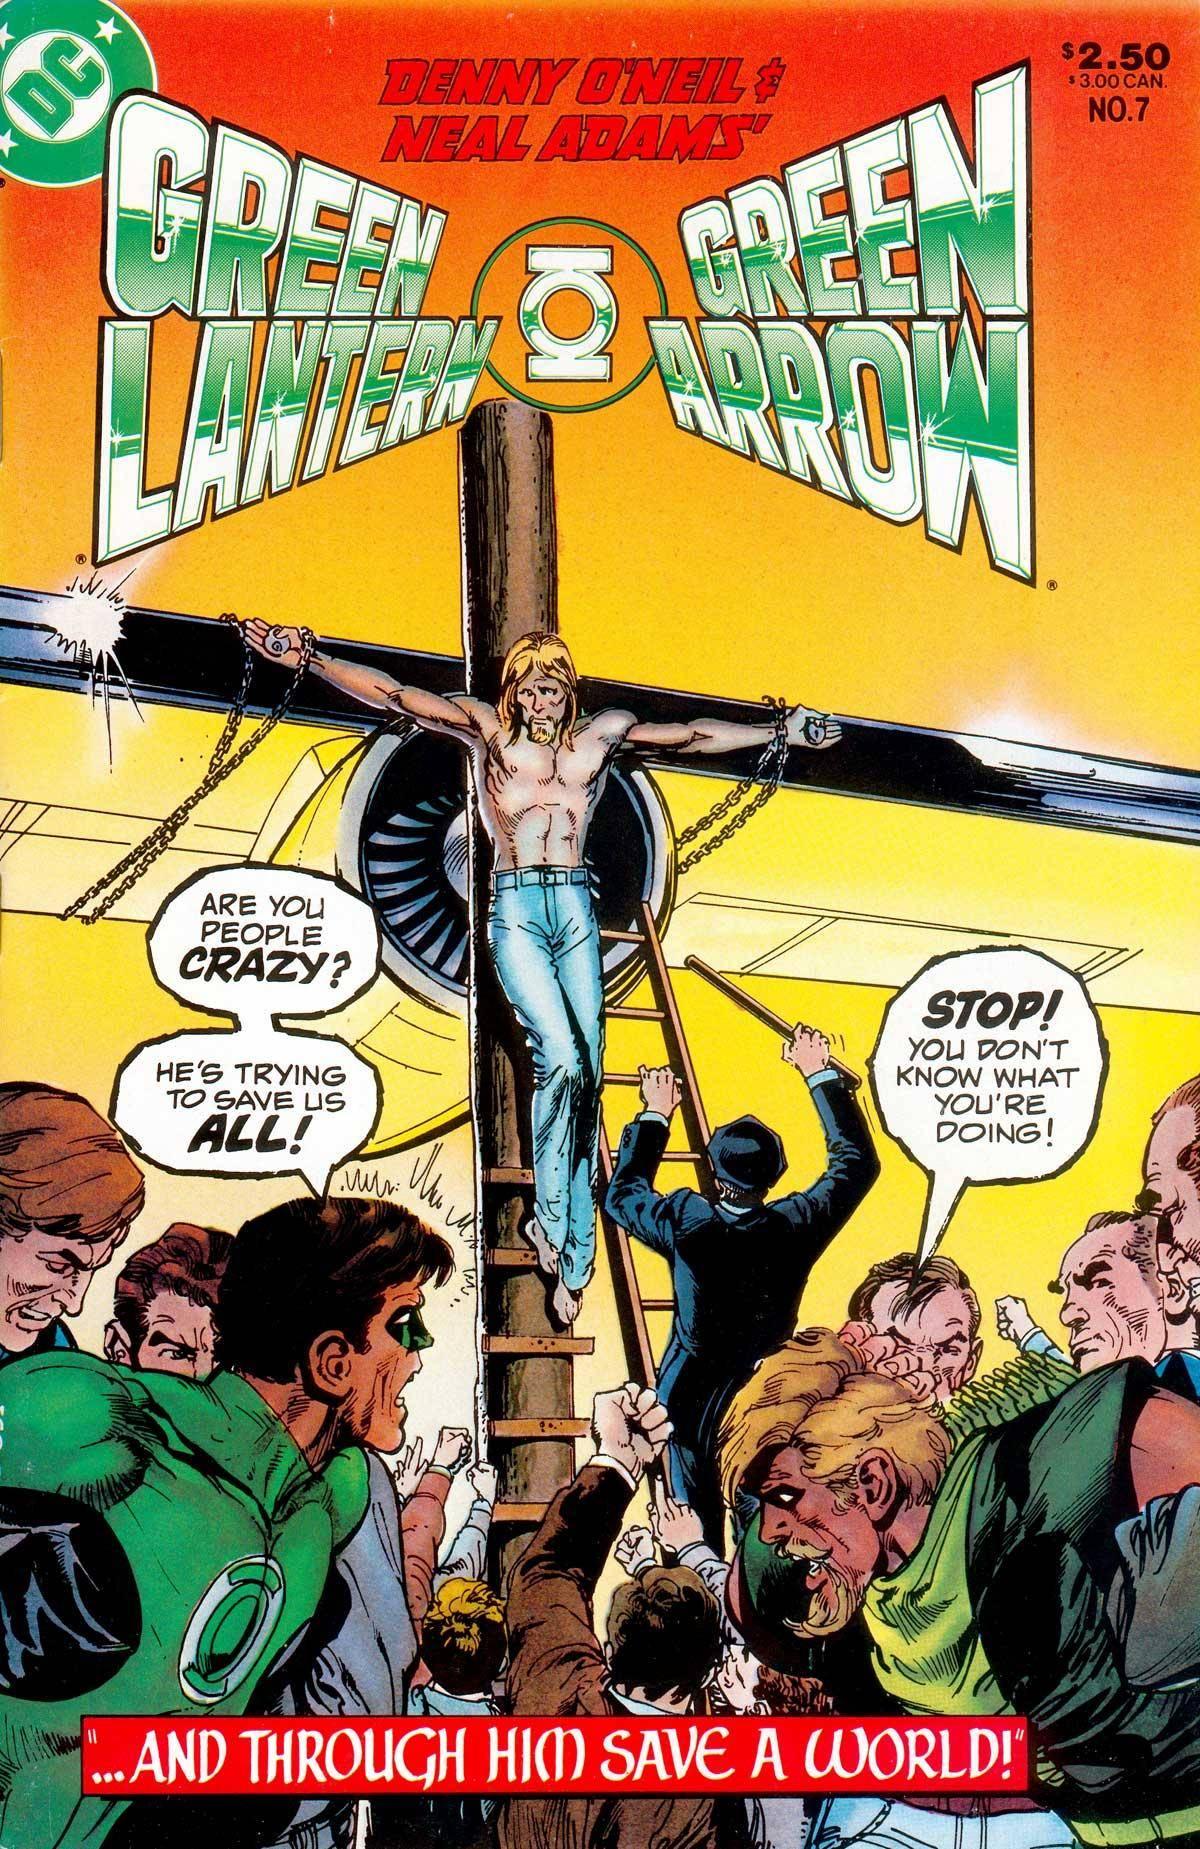 For PostalPops Green Lantern  Green Arrow 07 cbz